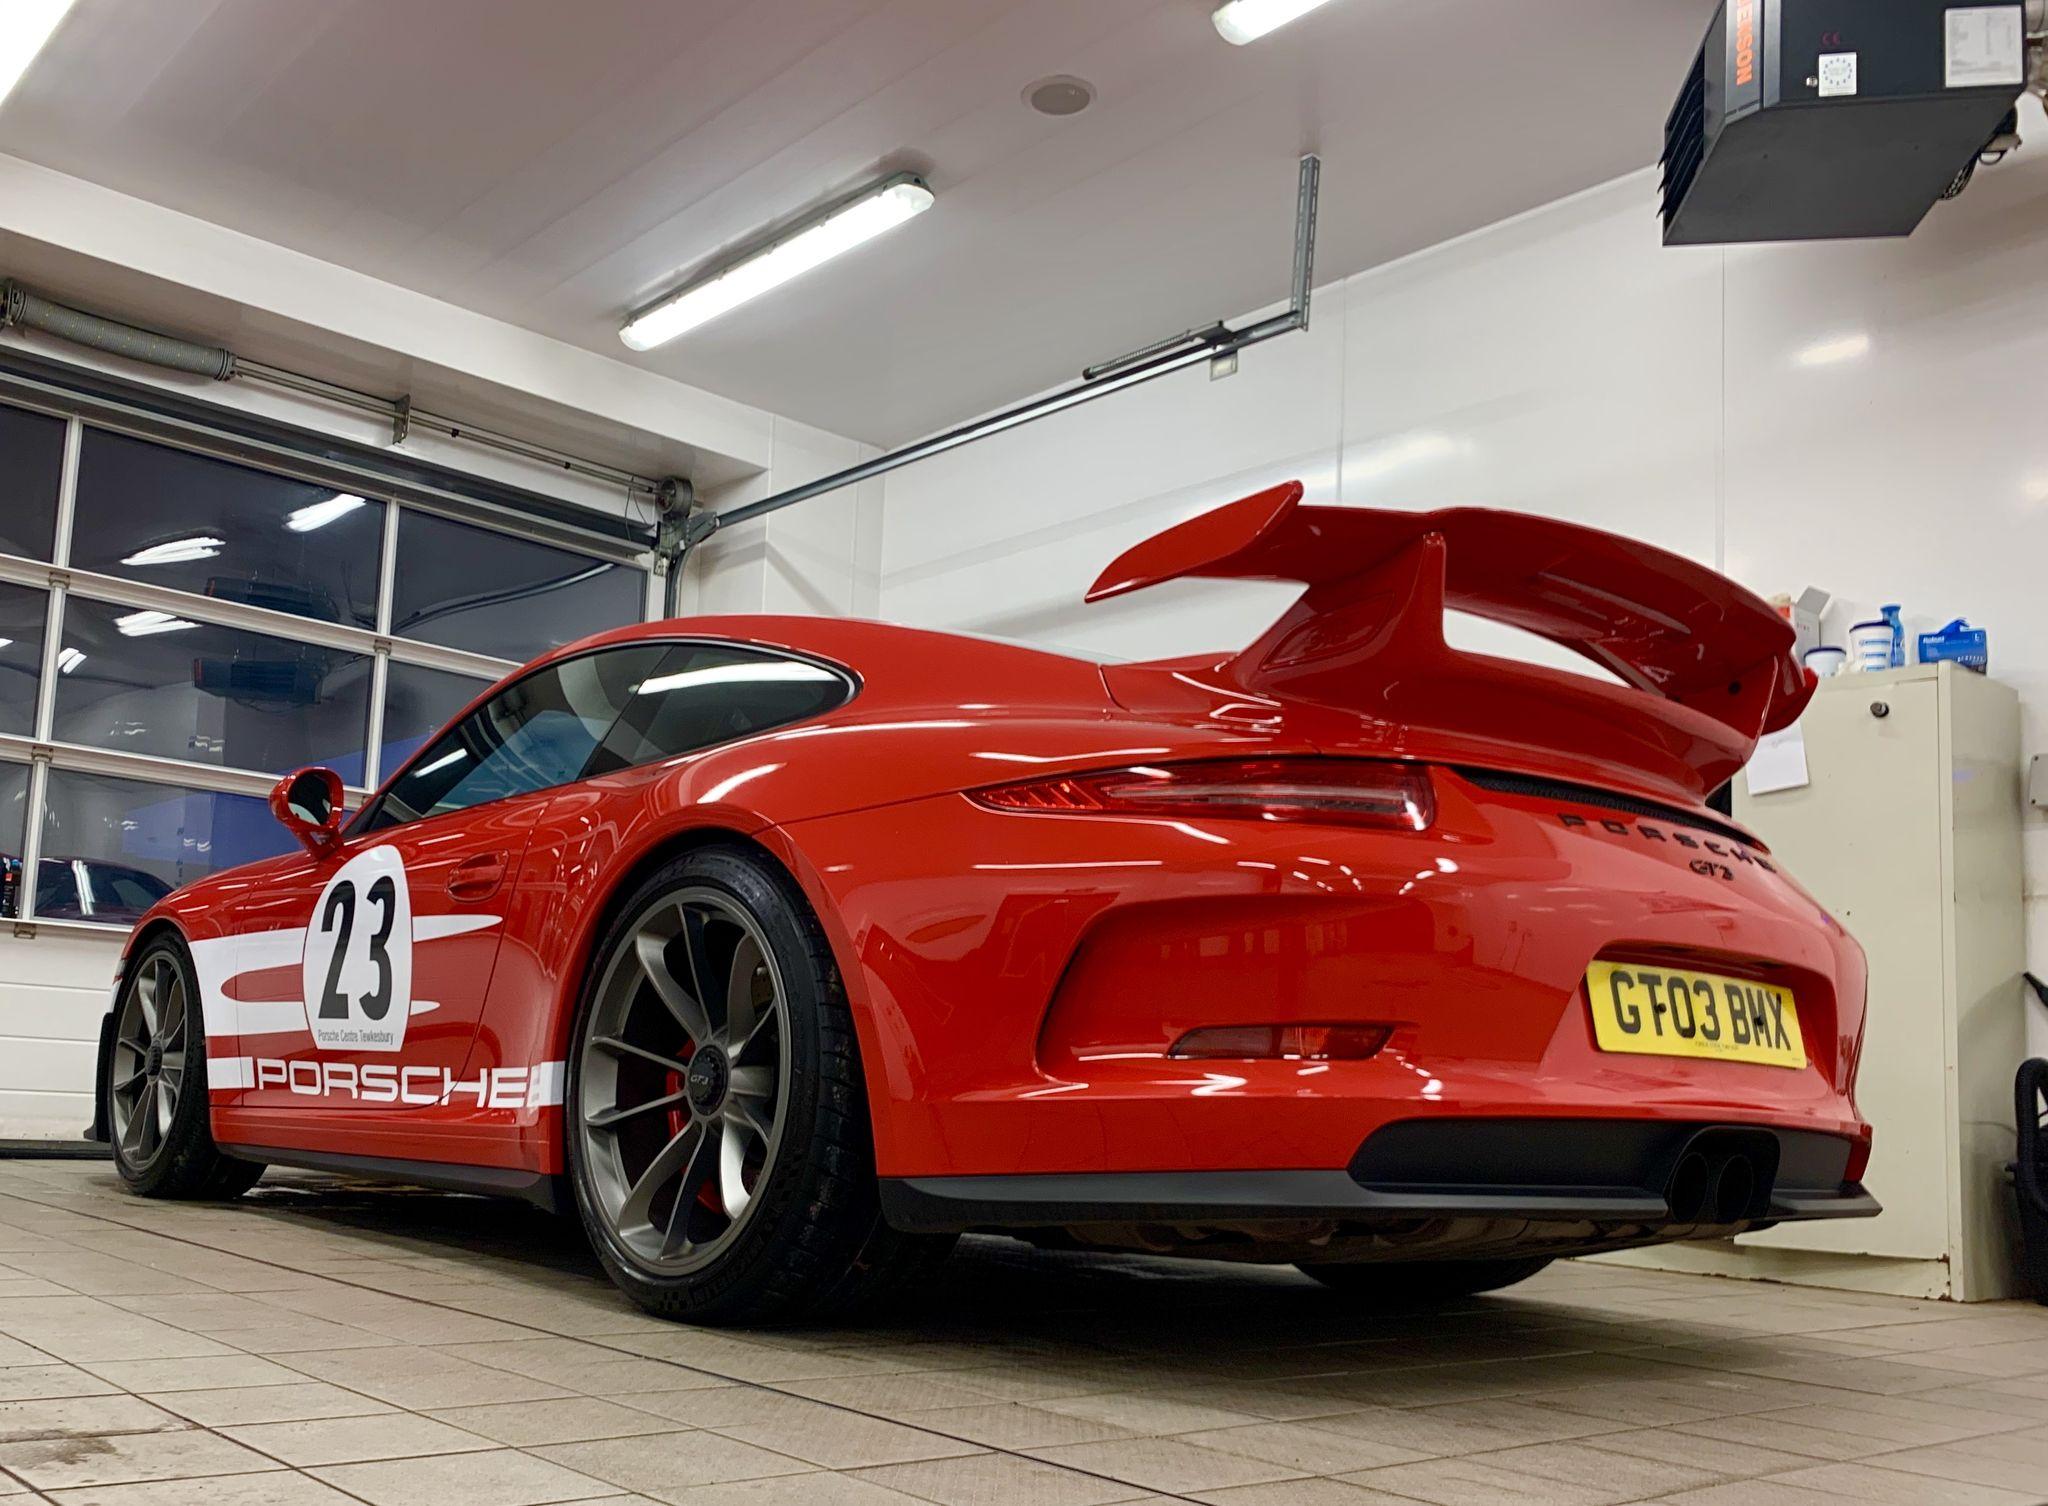 Porsche 911 GT3 Rear - The Perfect Road Trip